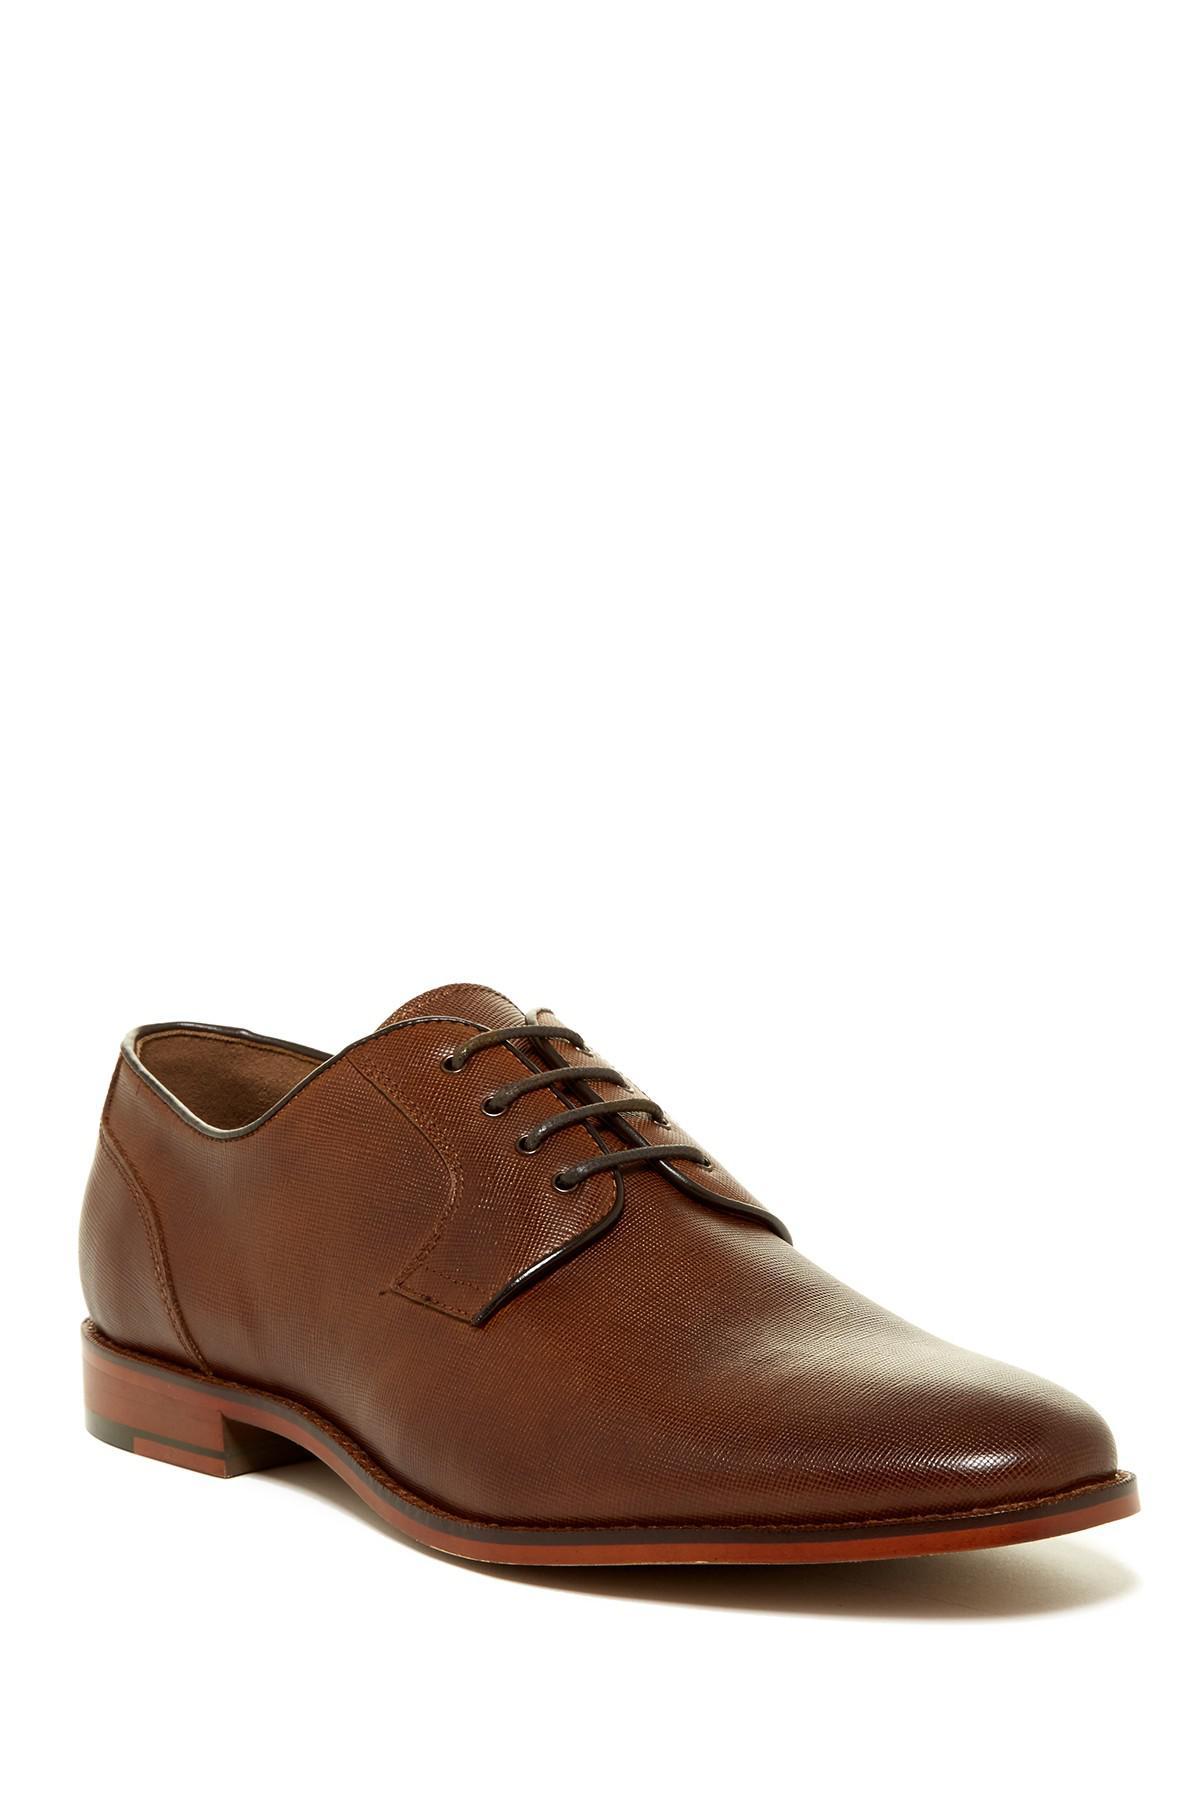 Gordon Rush Shoes Sale